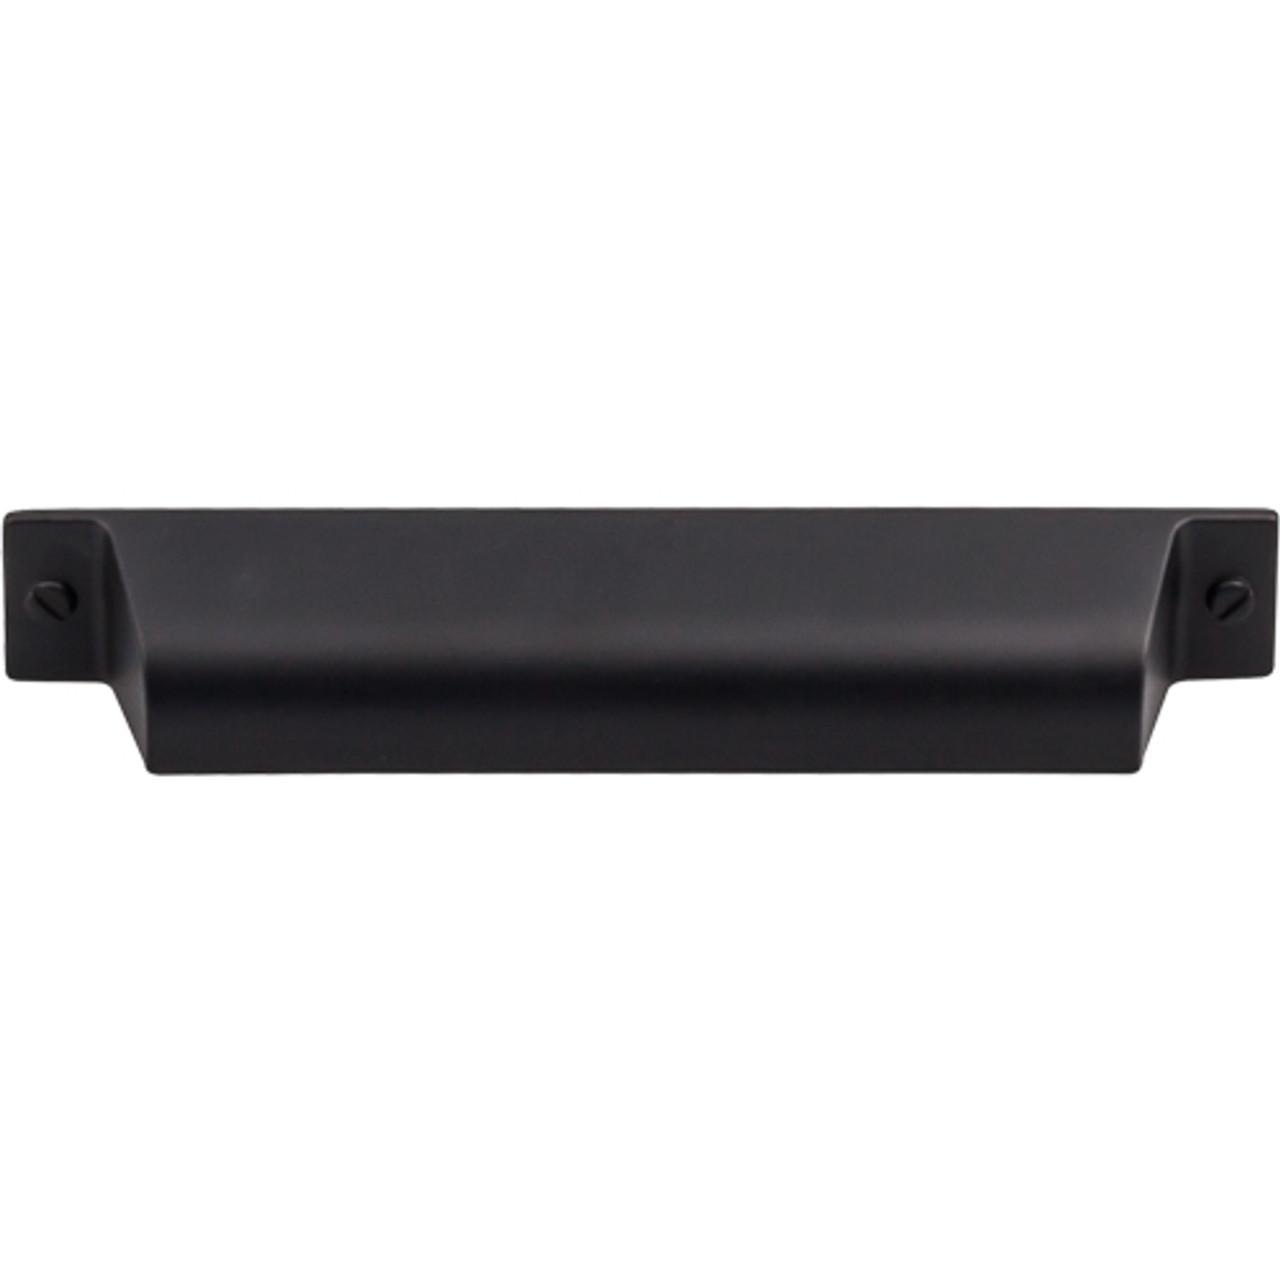 "Channing Cup Pull 5"" (c-c) - Flat Black (TKTK774BLK)"